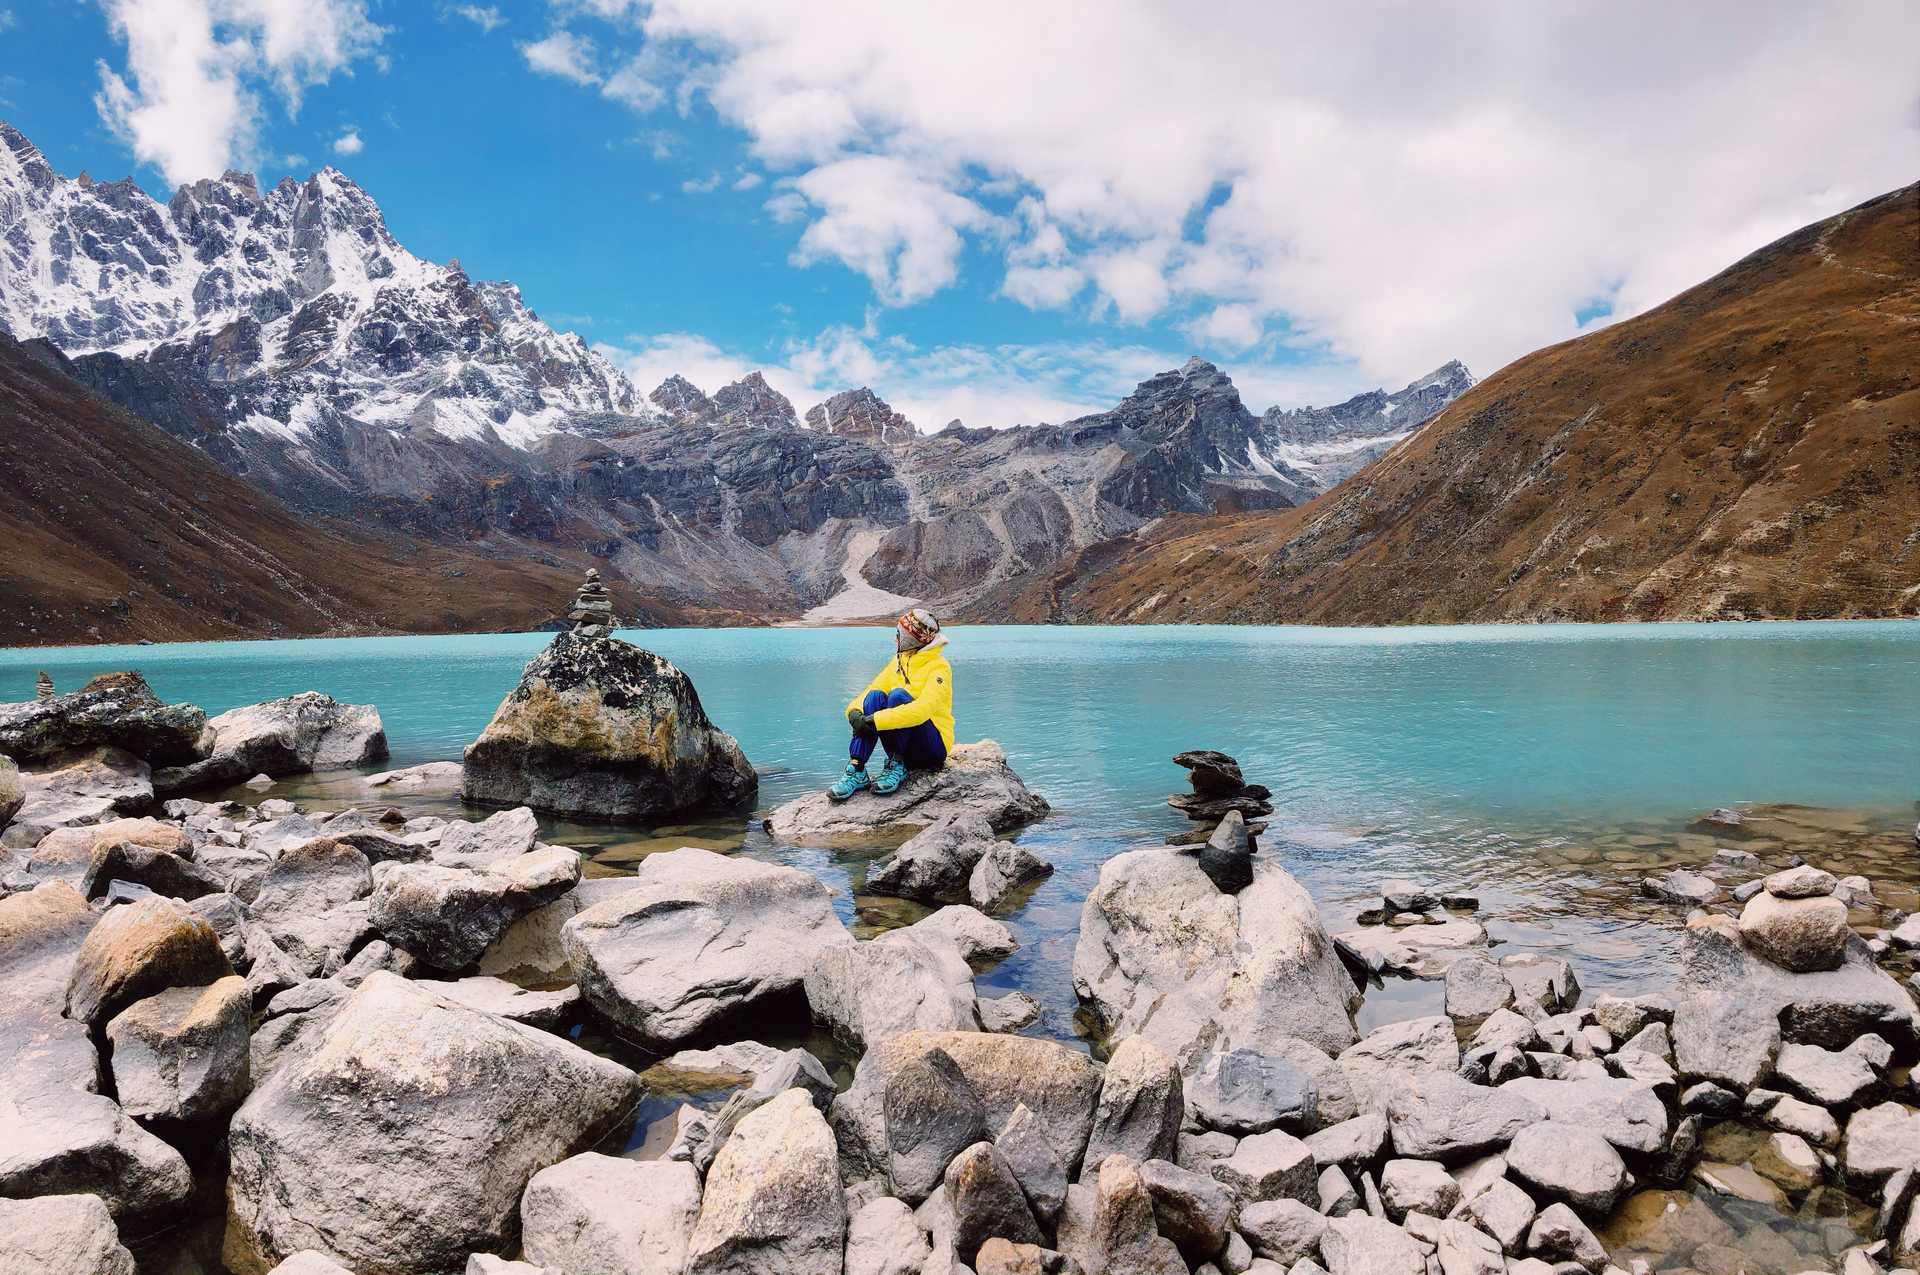 Hiker in front of Gokyo lake, Nepal